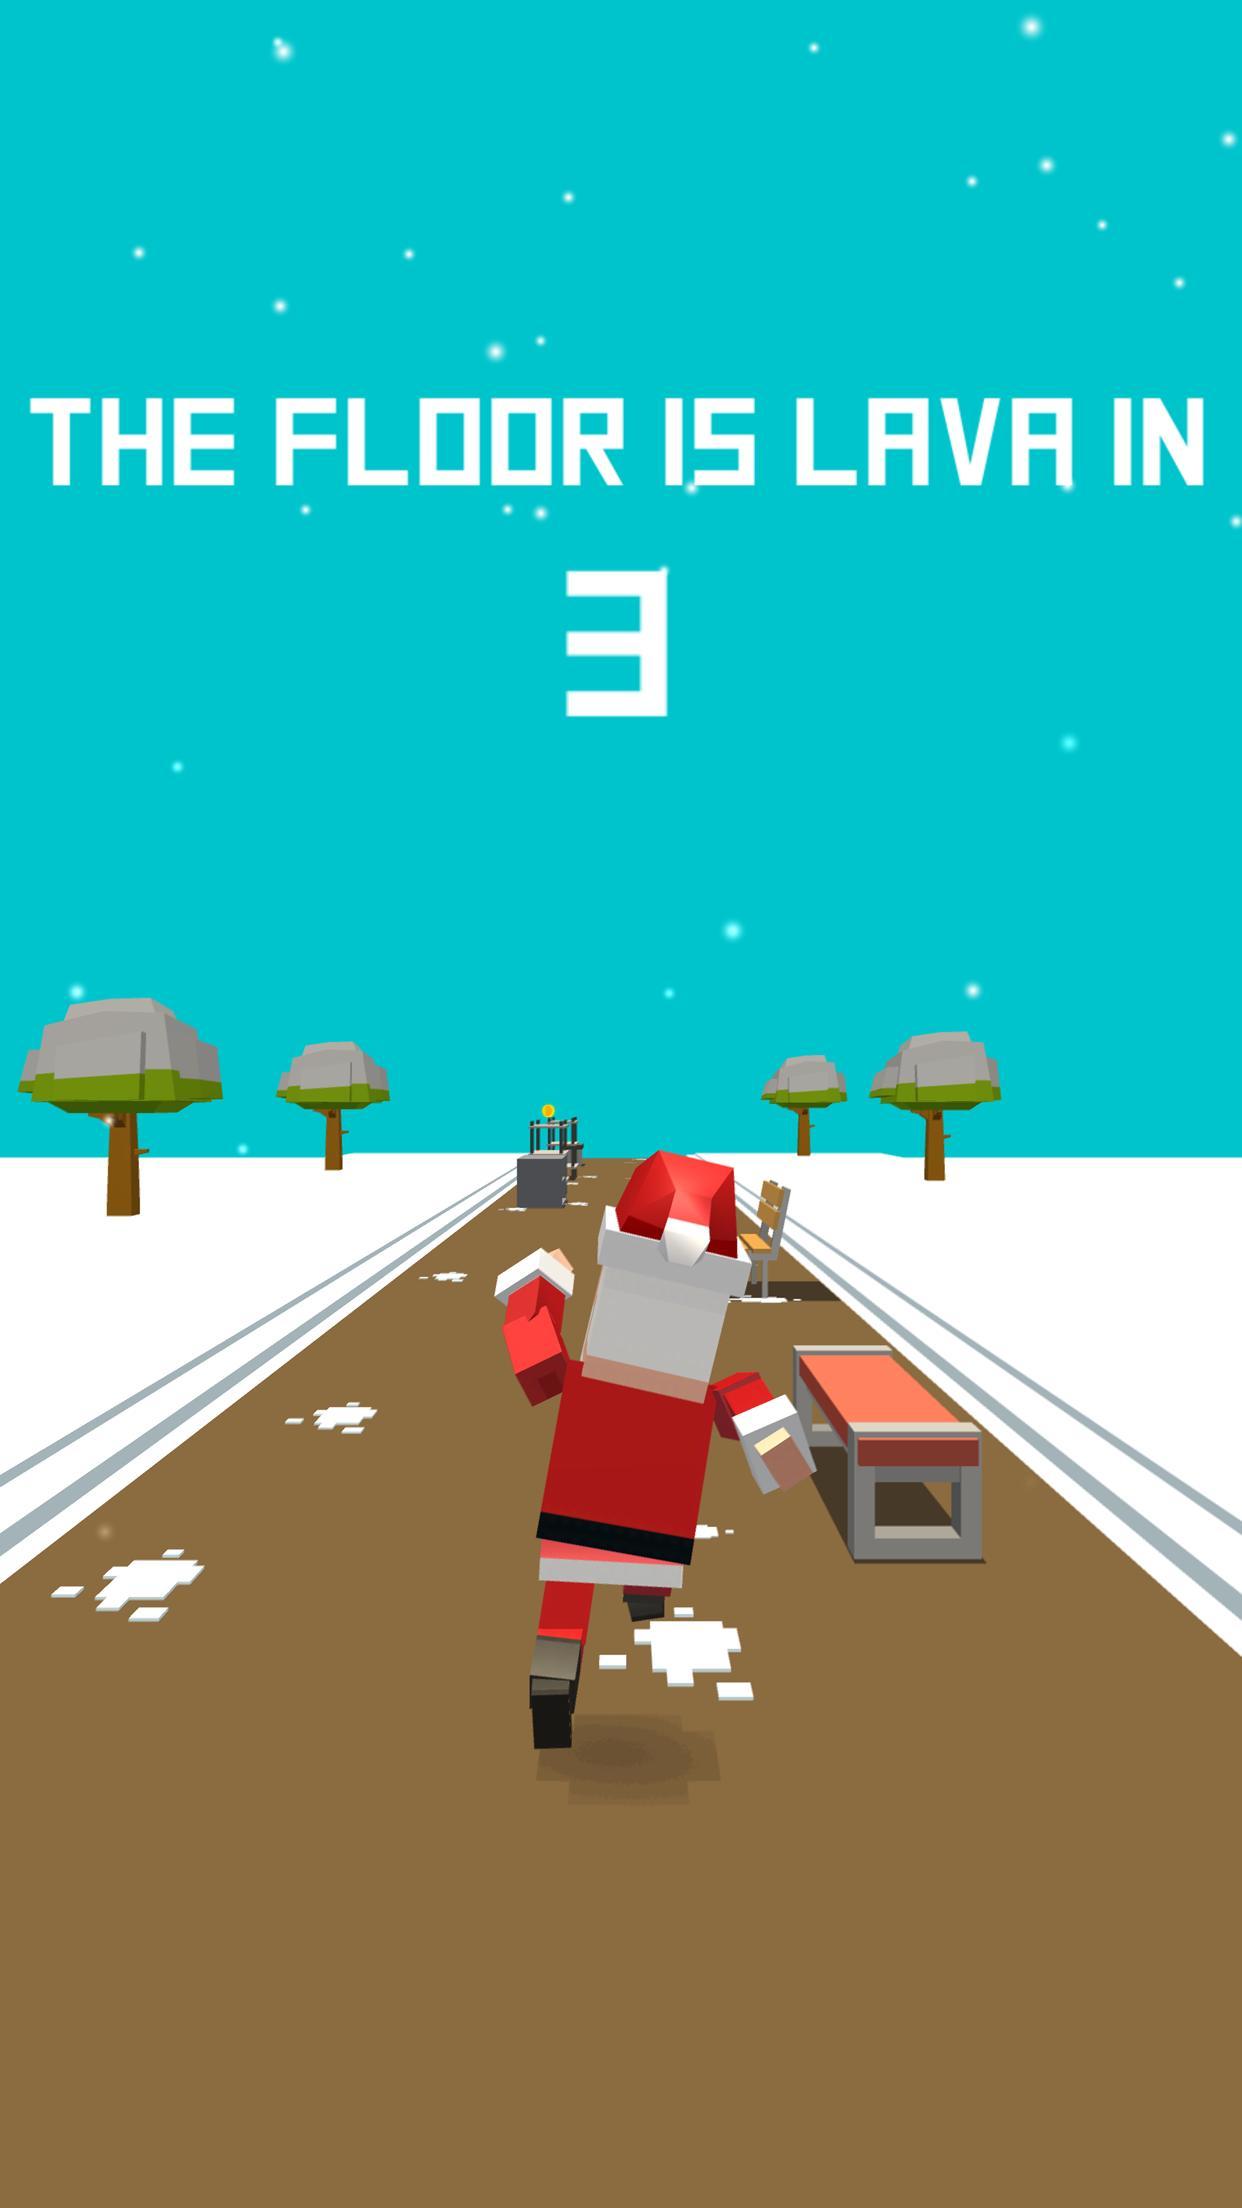 Xmas Floor is Lava Christmas holiday fun 2.6 Screenshot 3